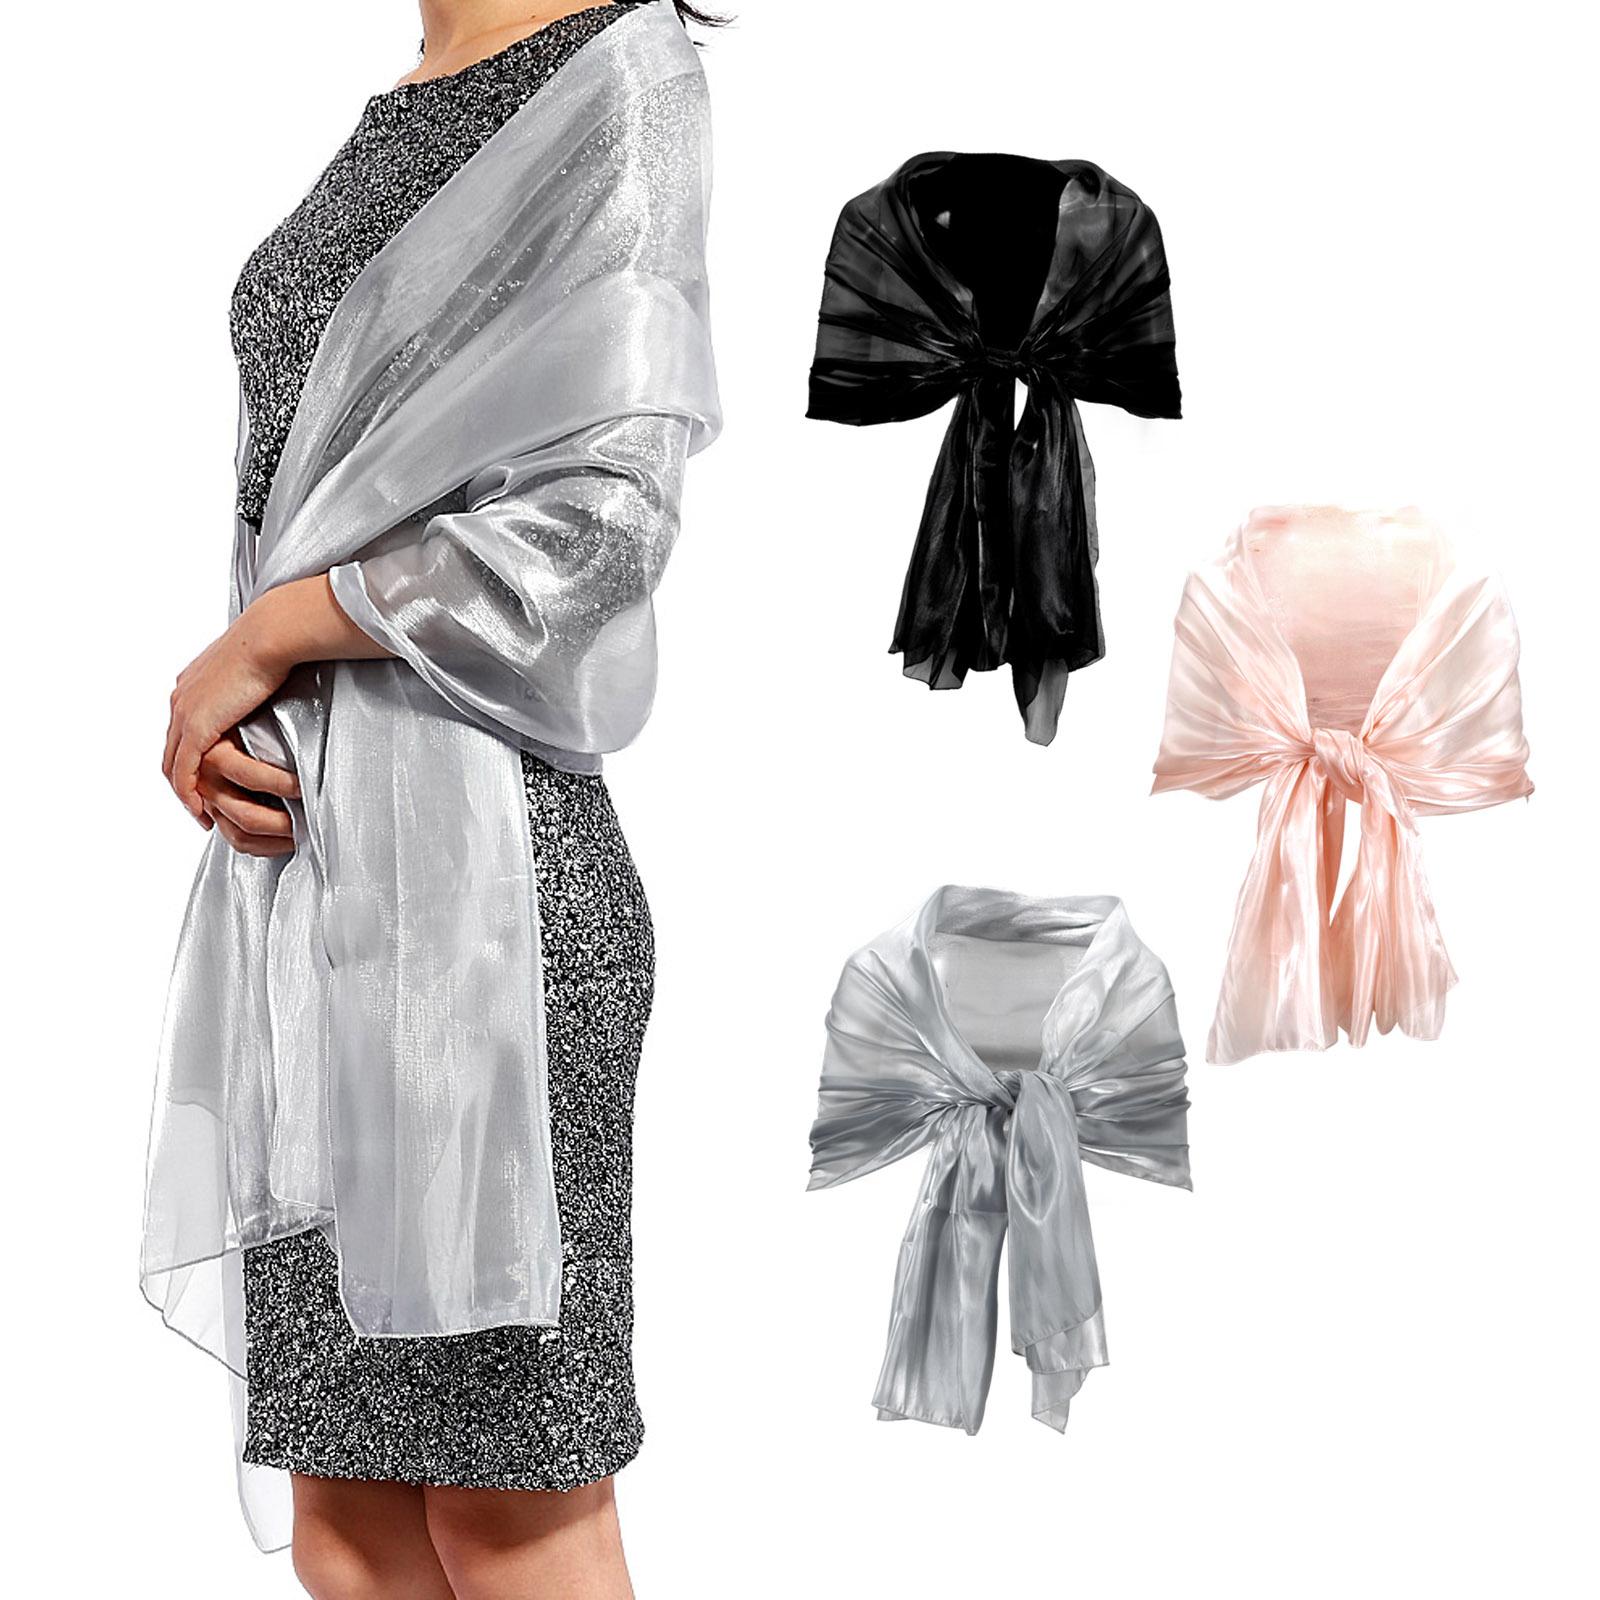 echarpe foulard soie femme ch che ch le silk 190cm soiree bapteme mariage fete ebay. Black Bedroom Furniture Sets. Home Design Ideas